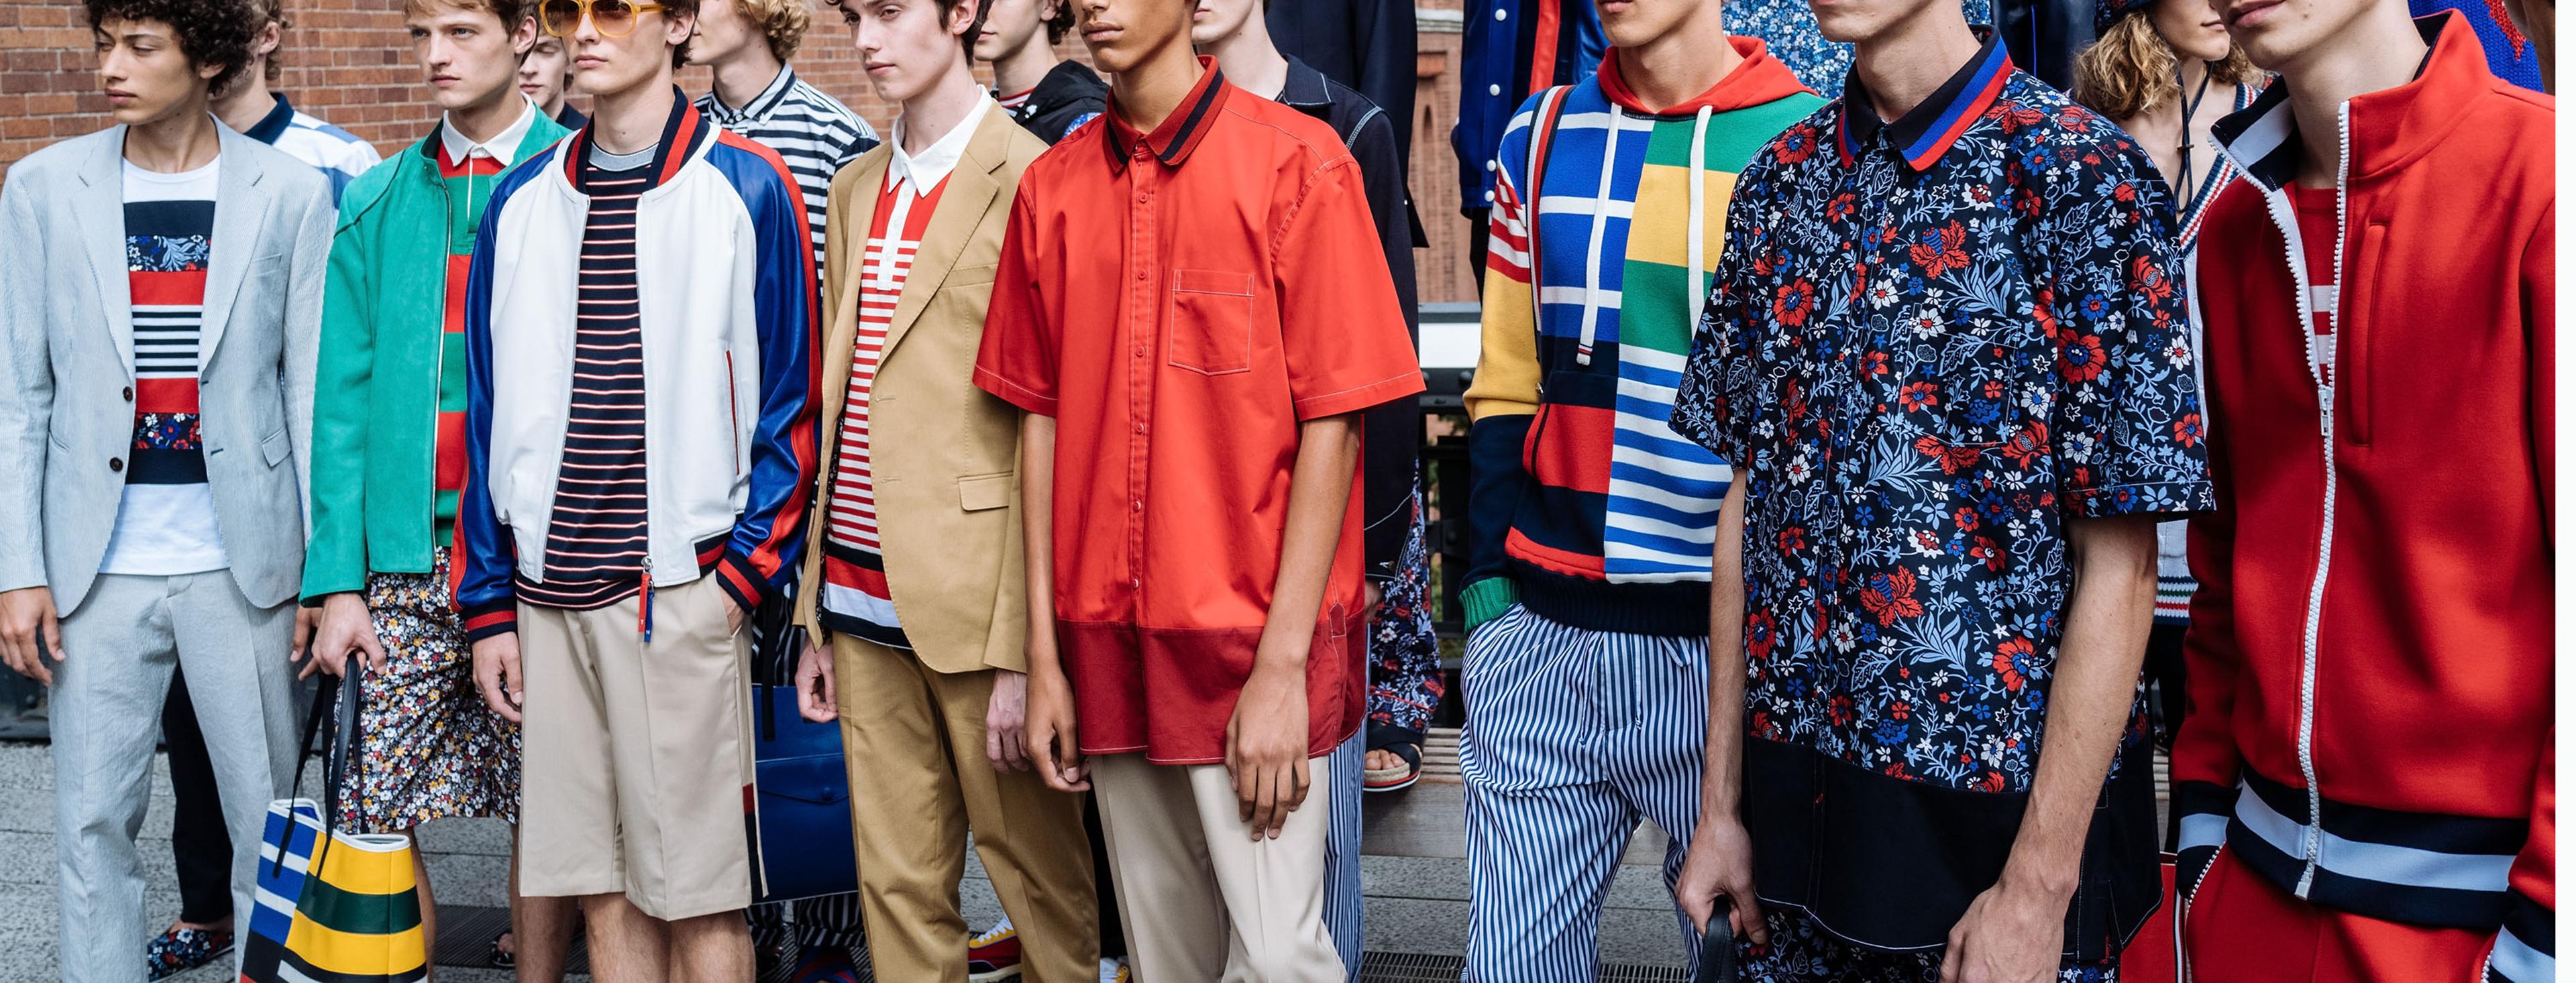 Tommy Hilfiger Spring 2017 Men's Tailored Collection Presentation - Alternative Views